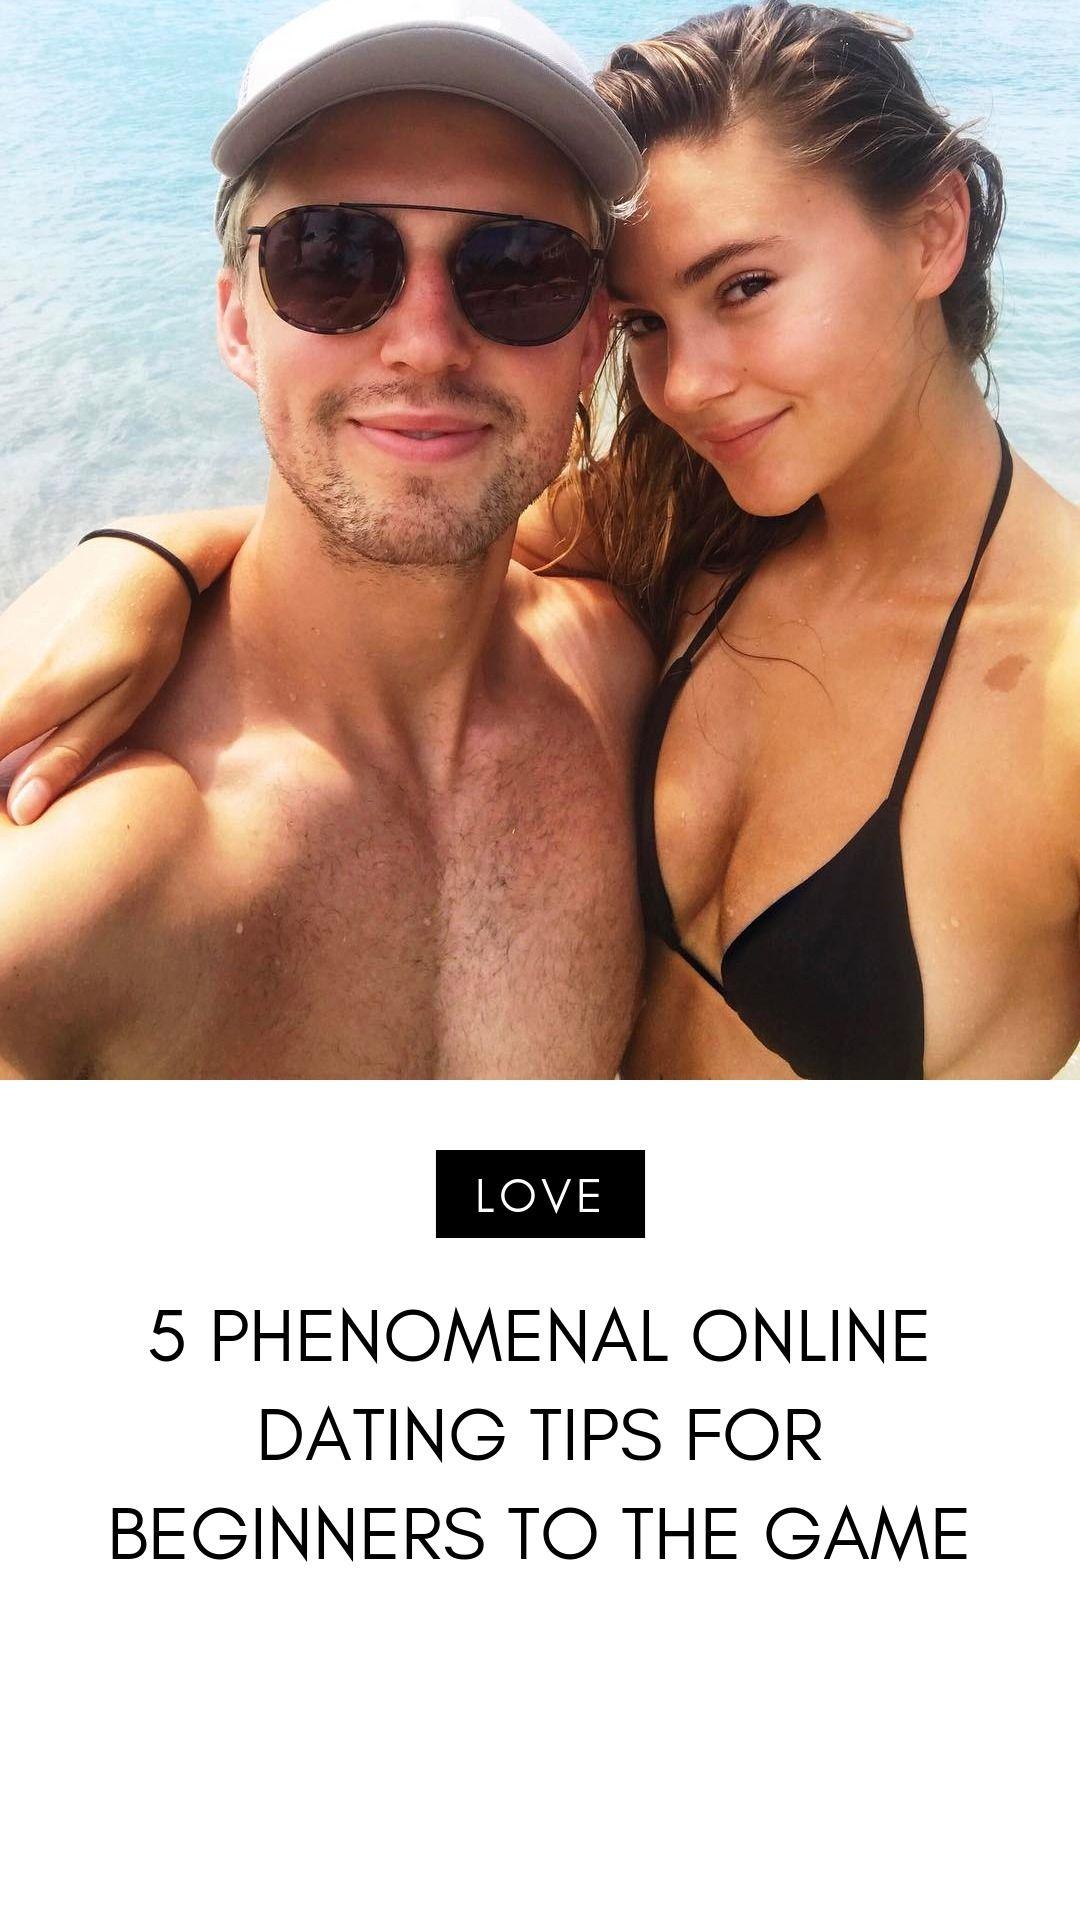 15 year age gap dating